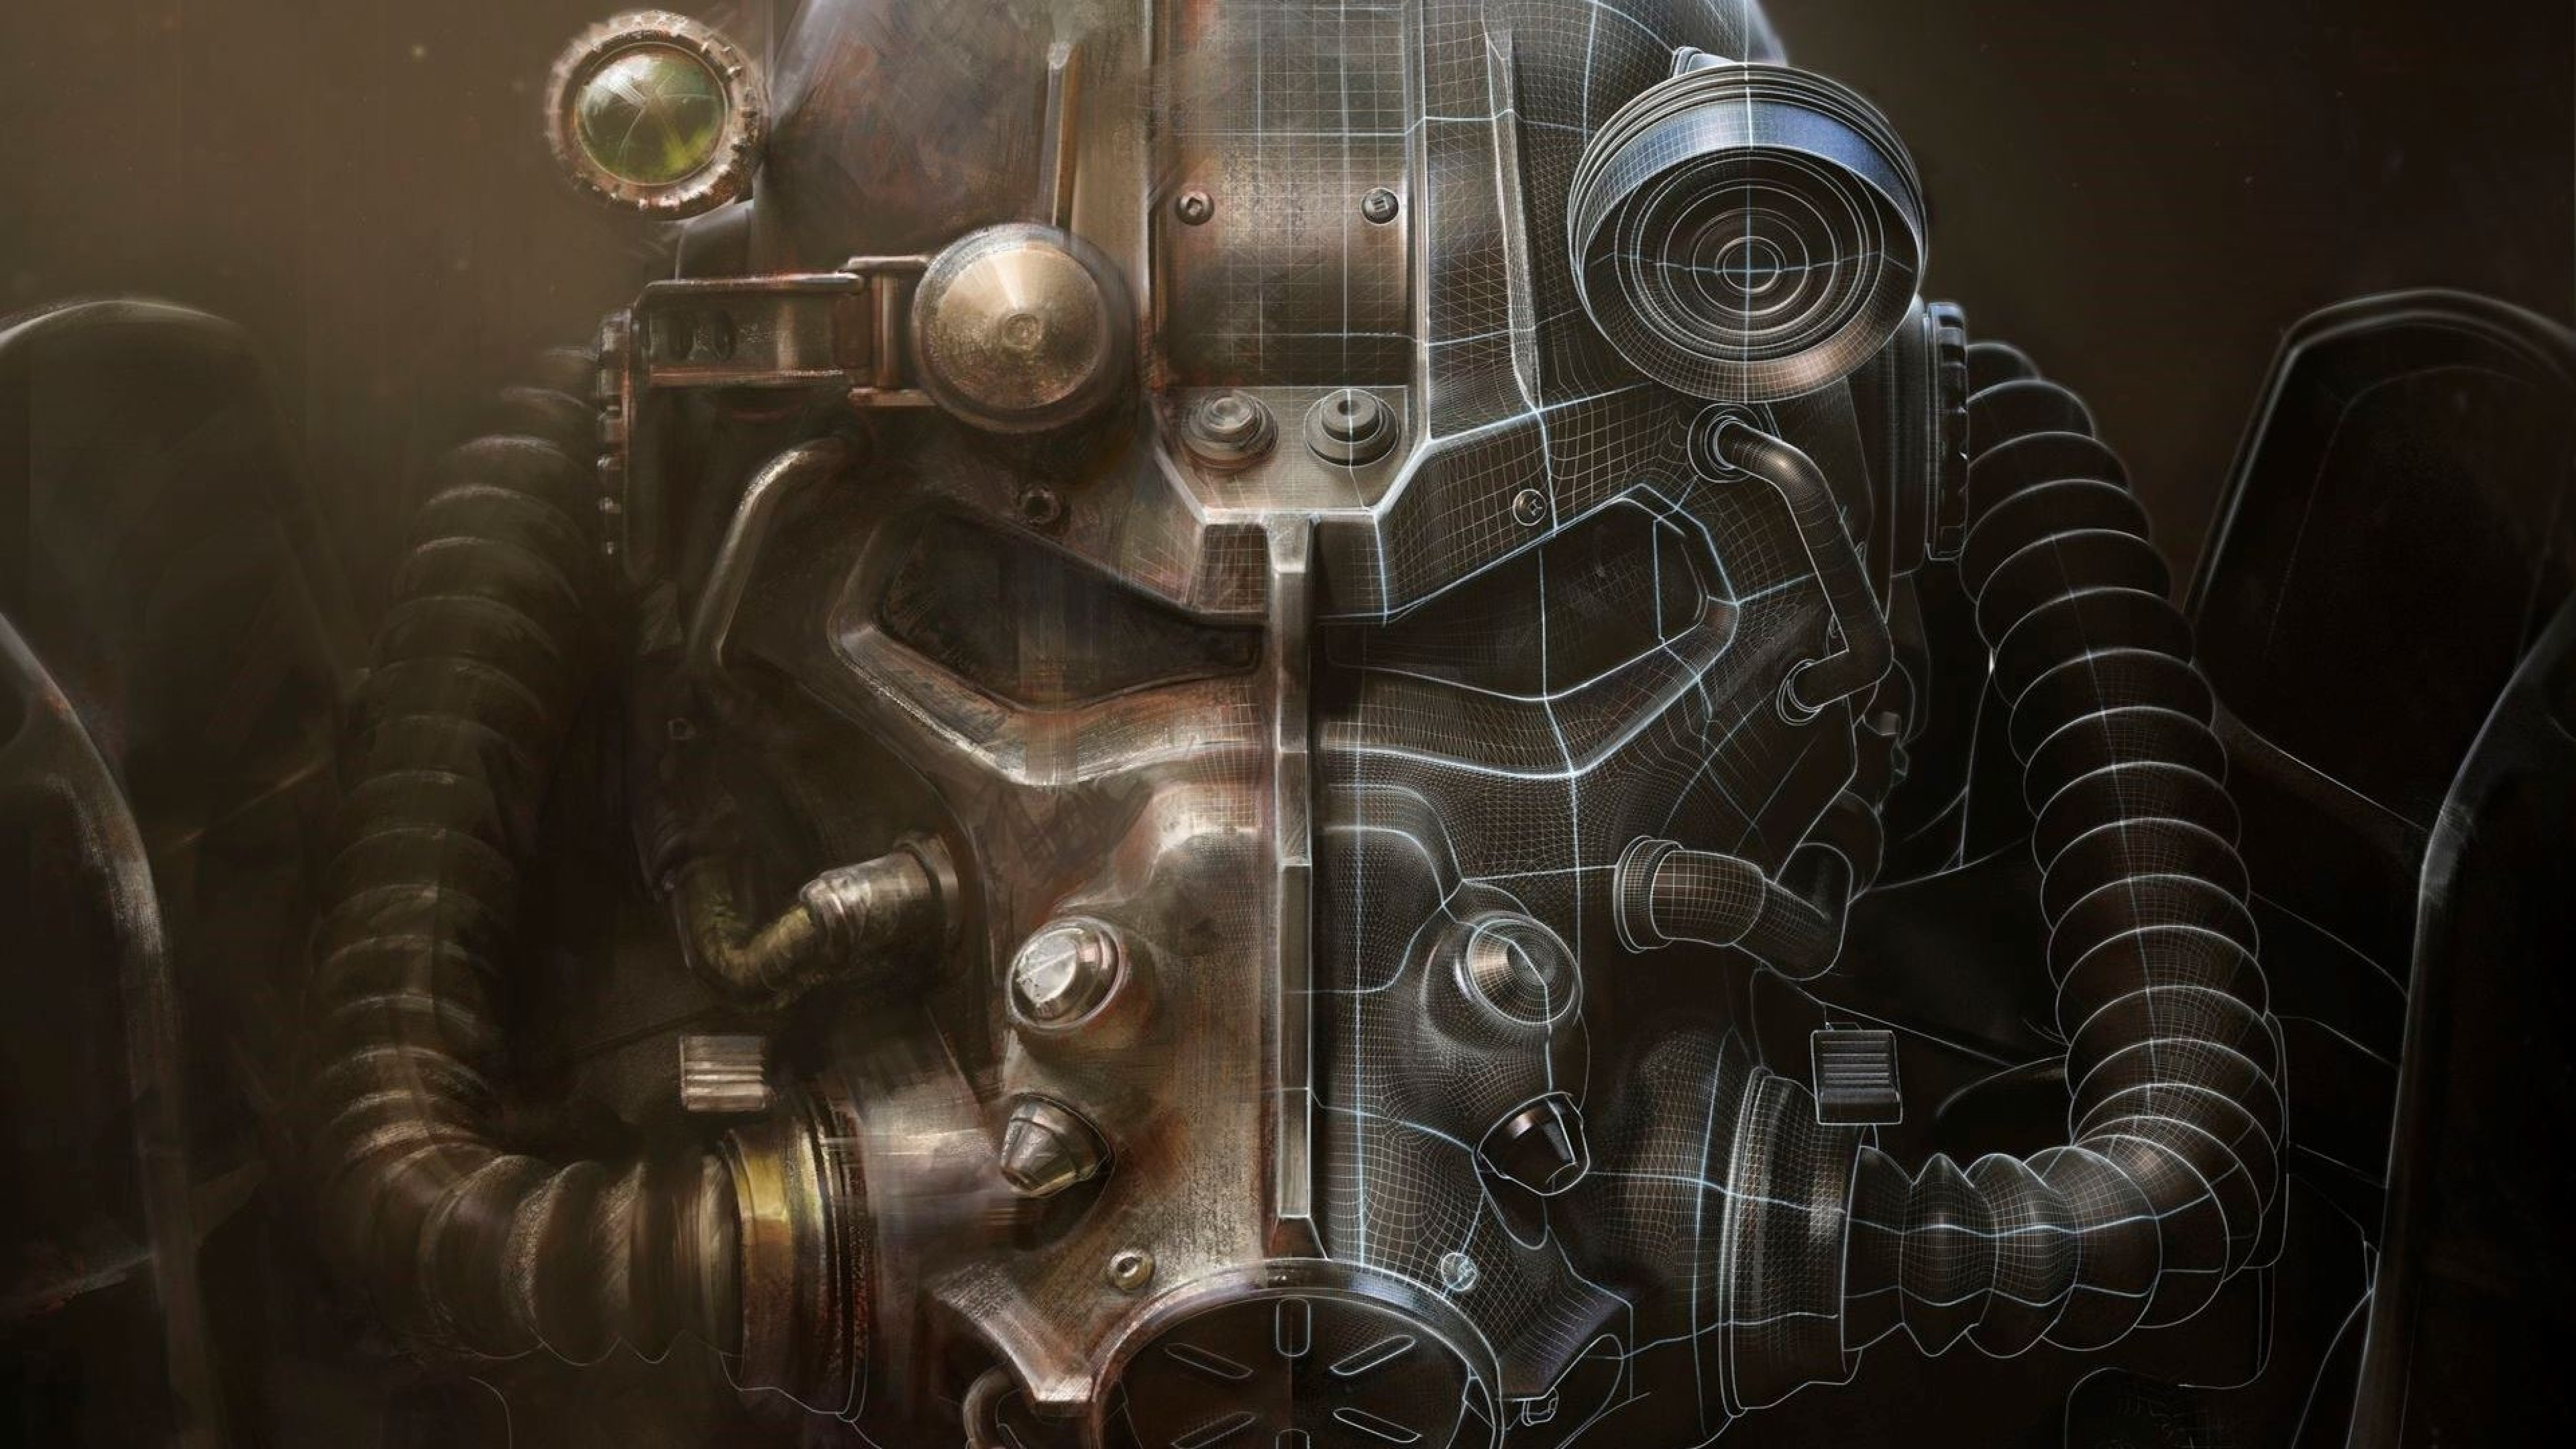 [48+] 4K Fallout 4 Wallpaper on WallpaperSafari